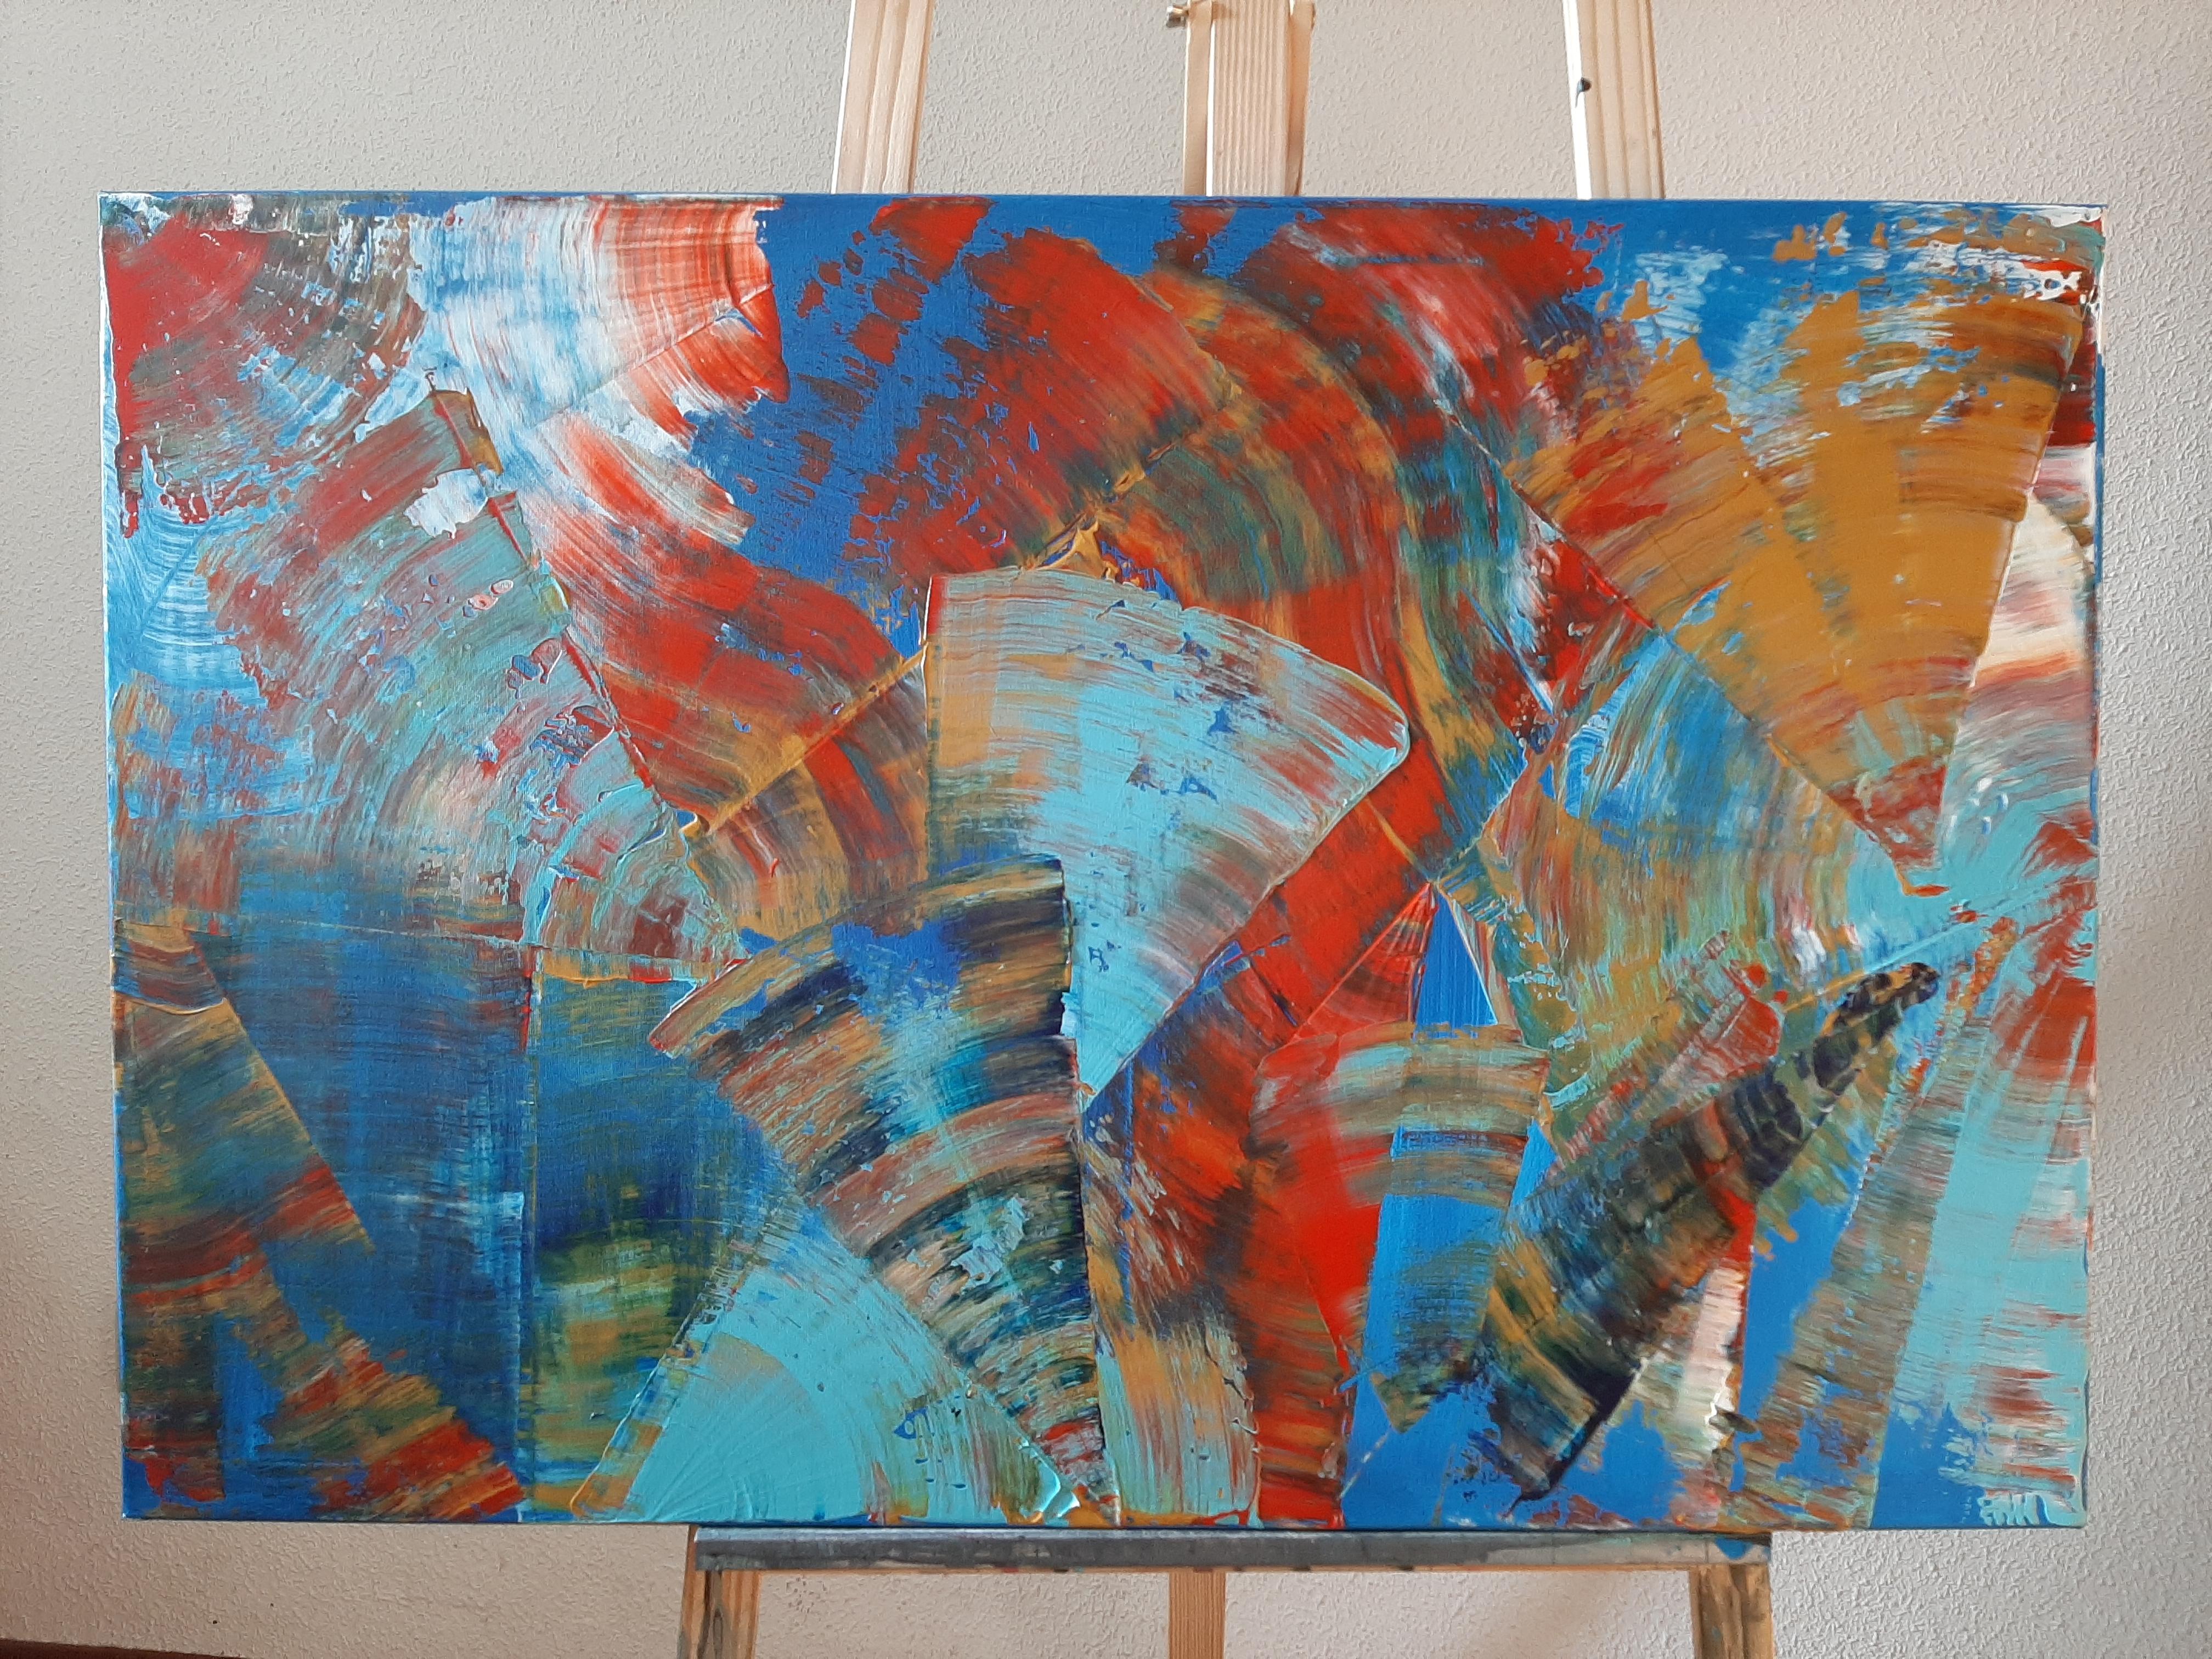 Sueños próximos en Azul, 90x60, 200 euros